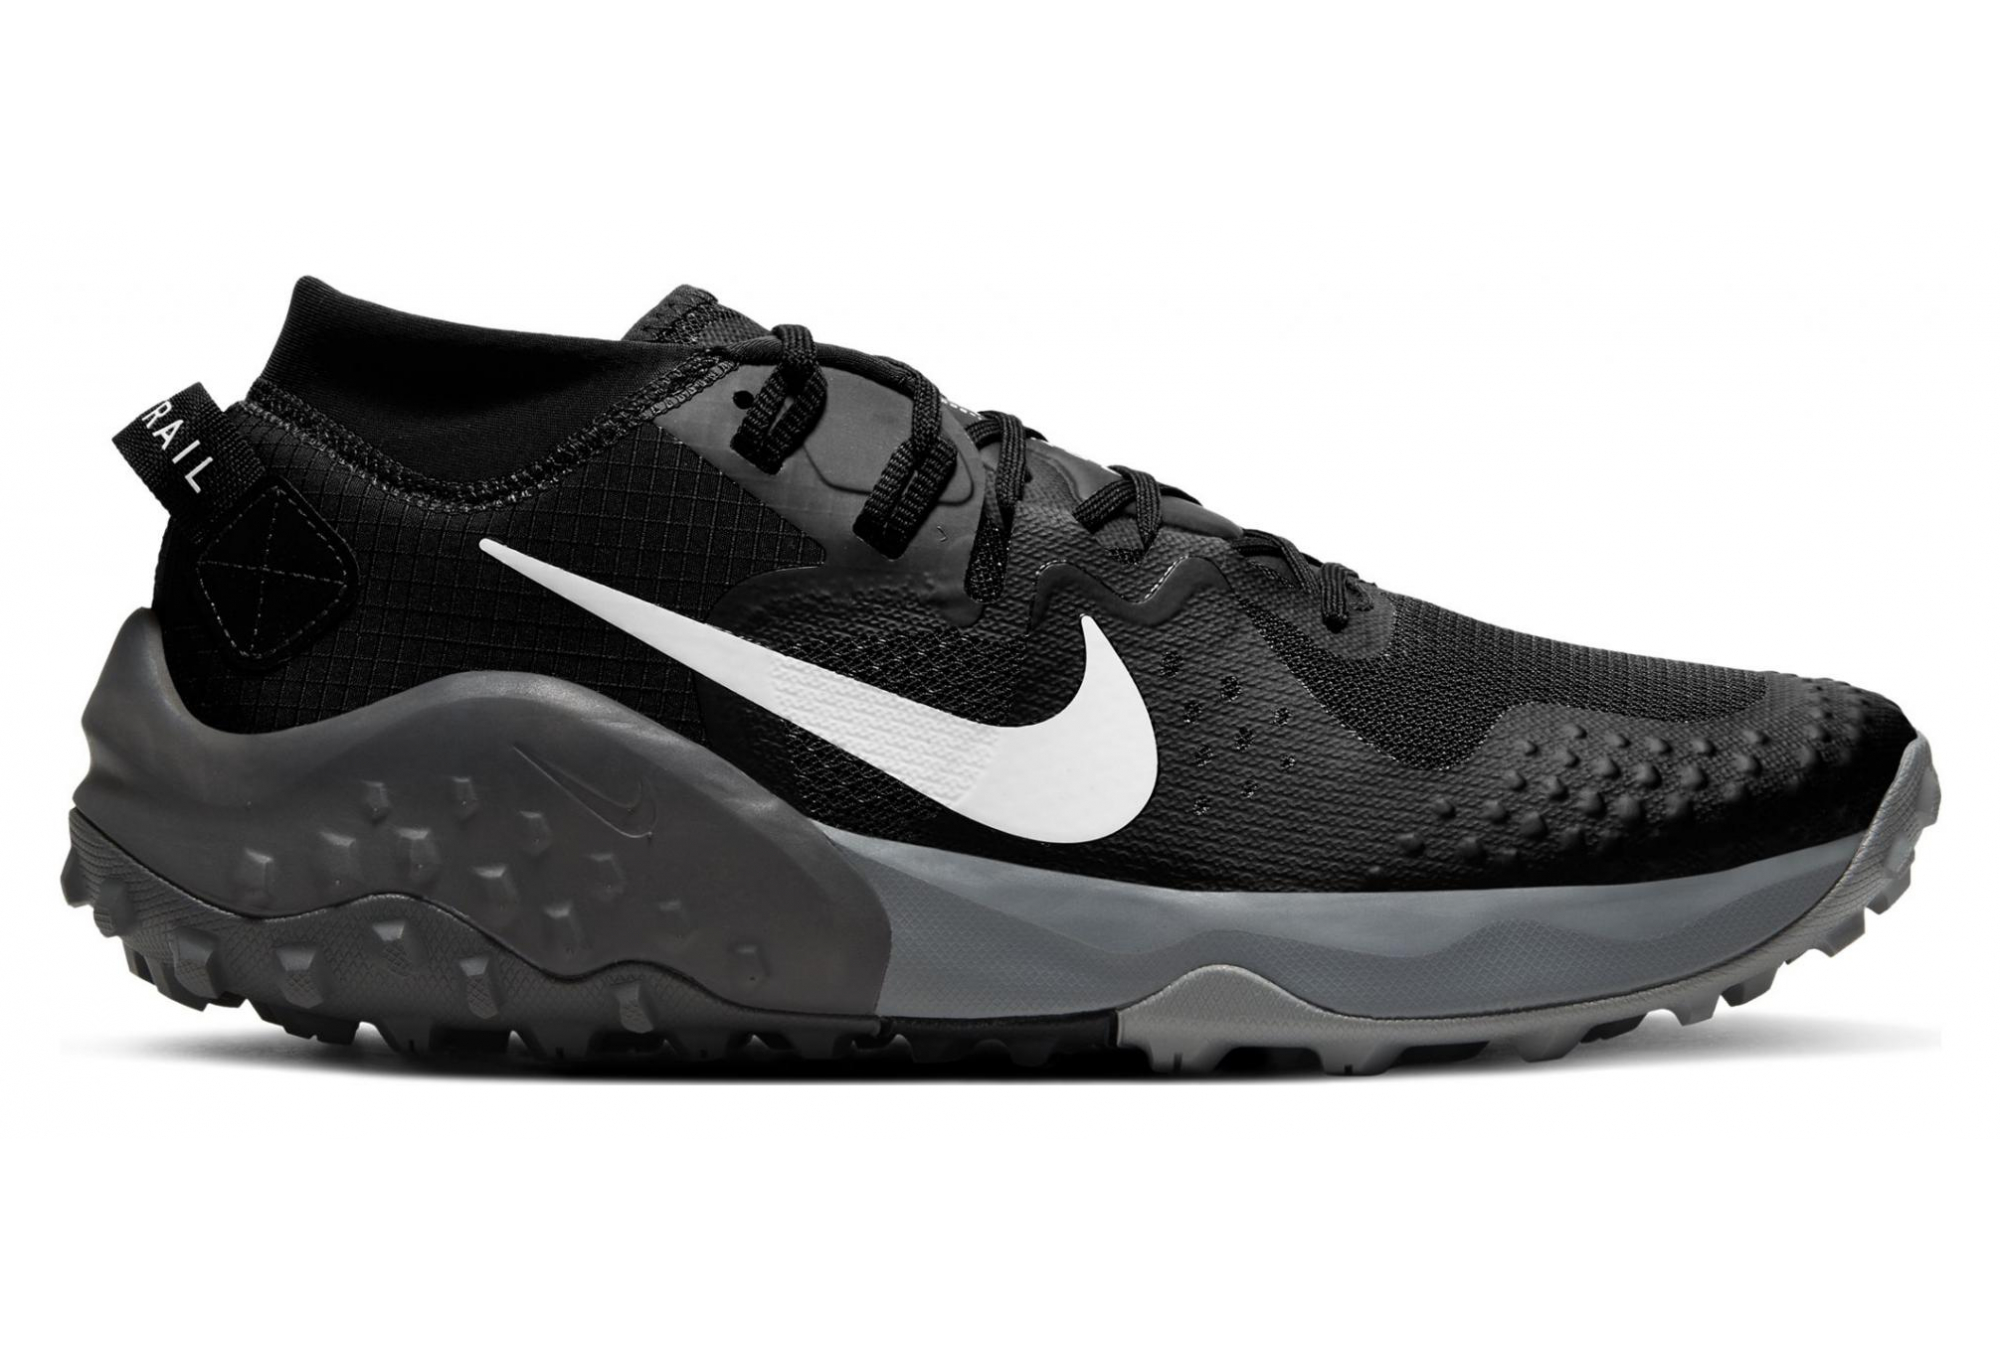 Chaussures de Trail Nike Wildhorse 6 Noir / Gris   Alltricks.fr